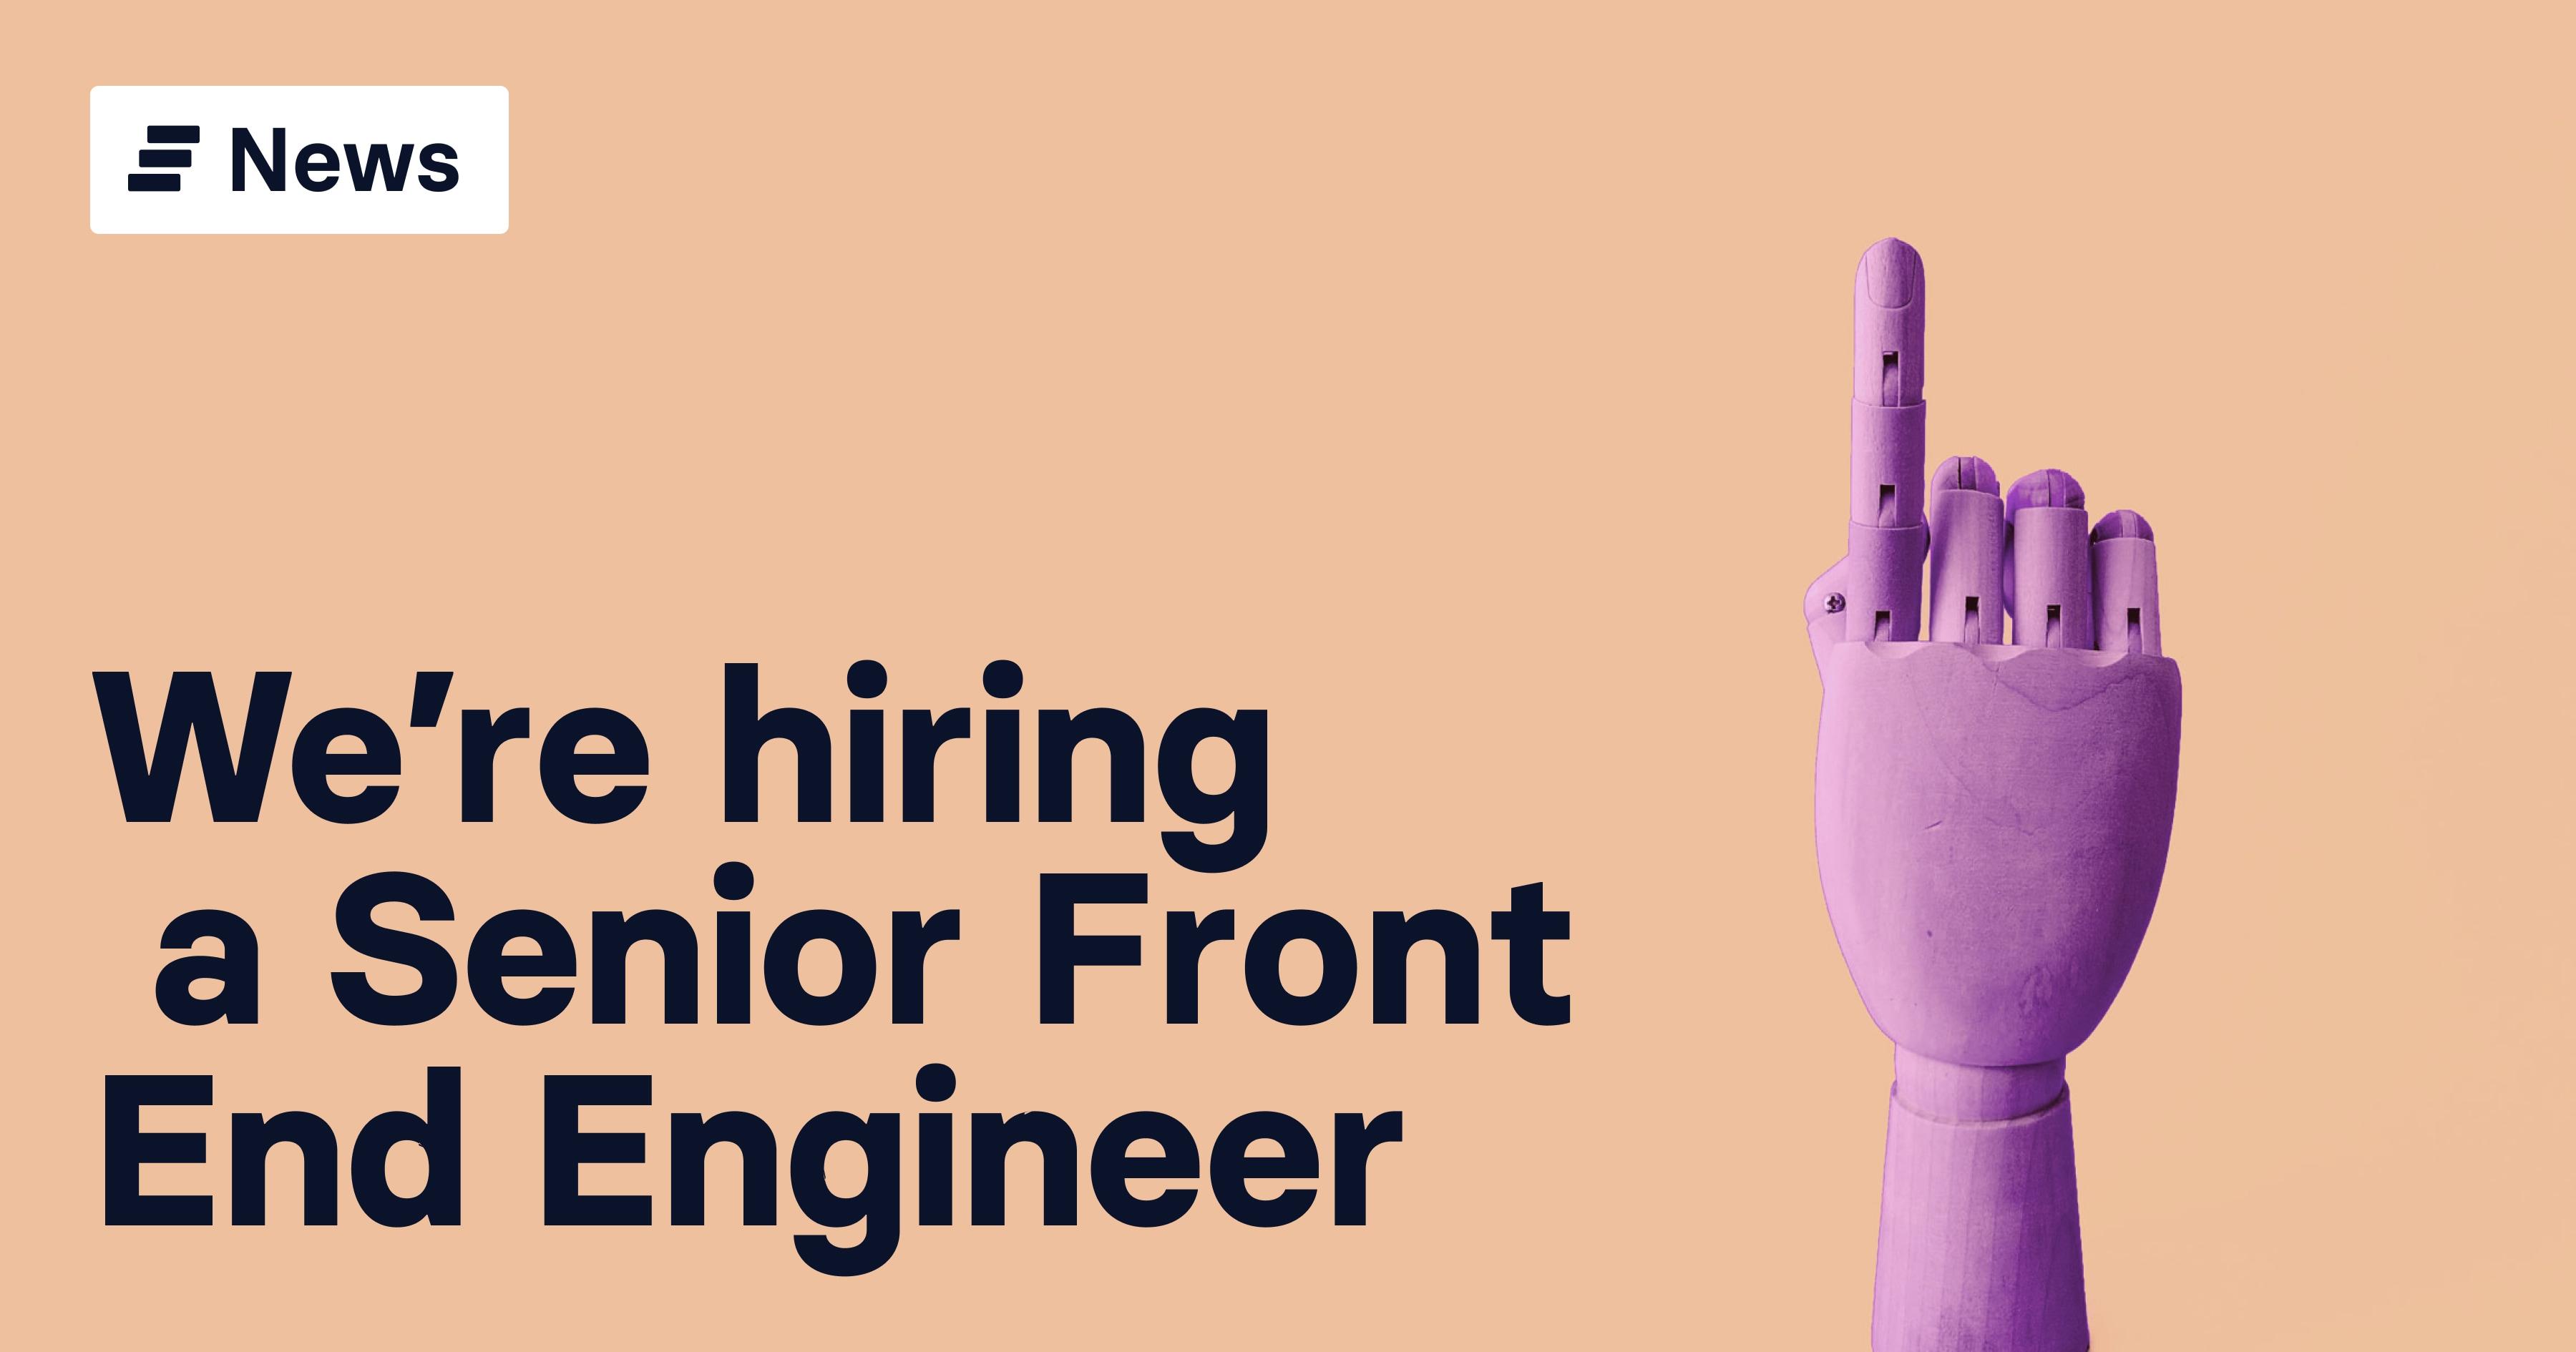 We're hiring: Senior Front End Engineer